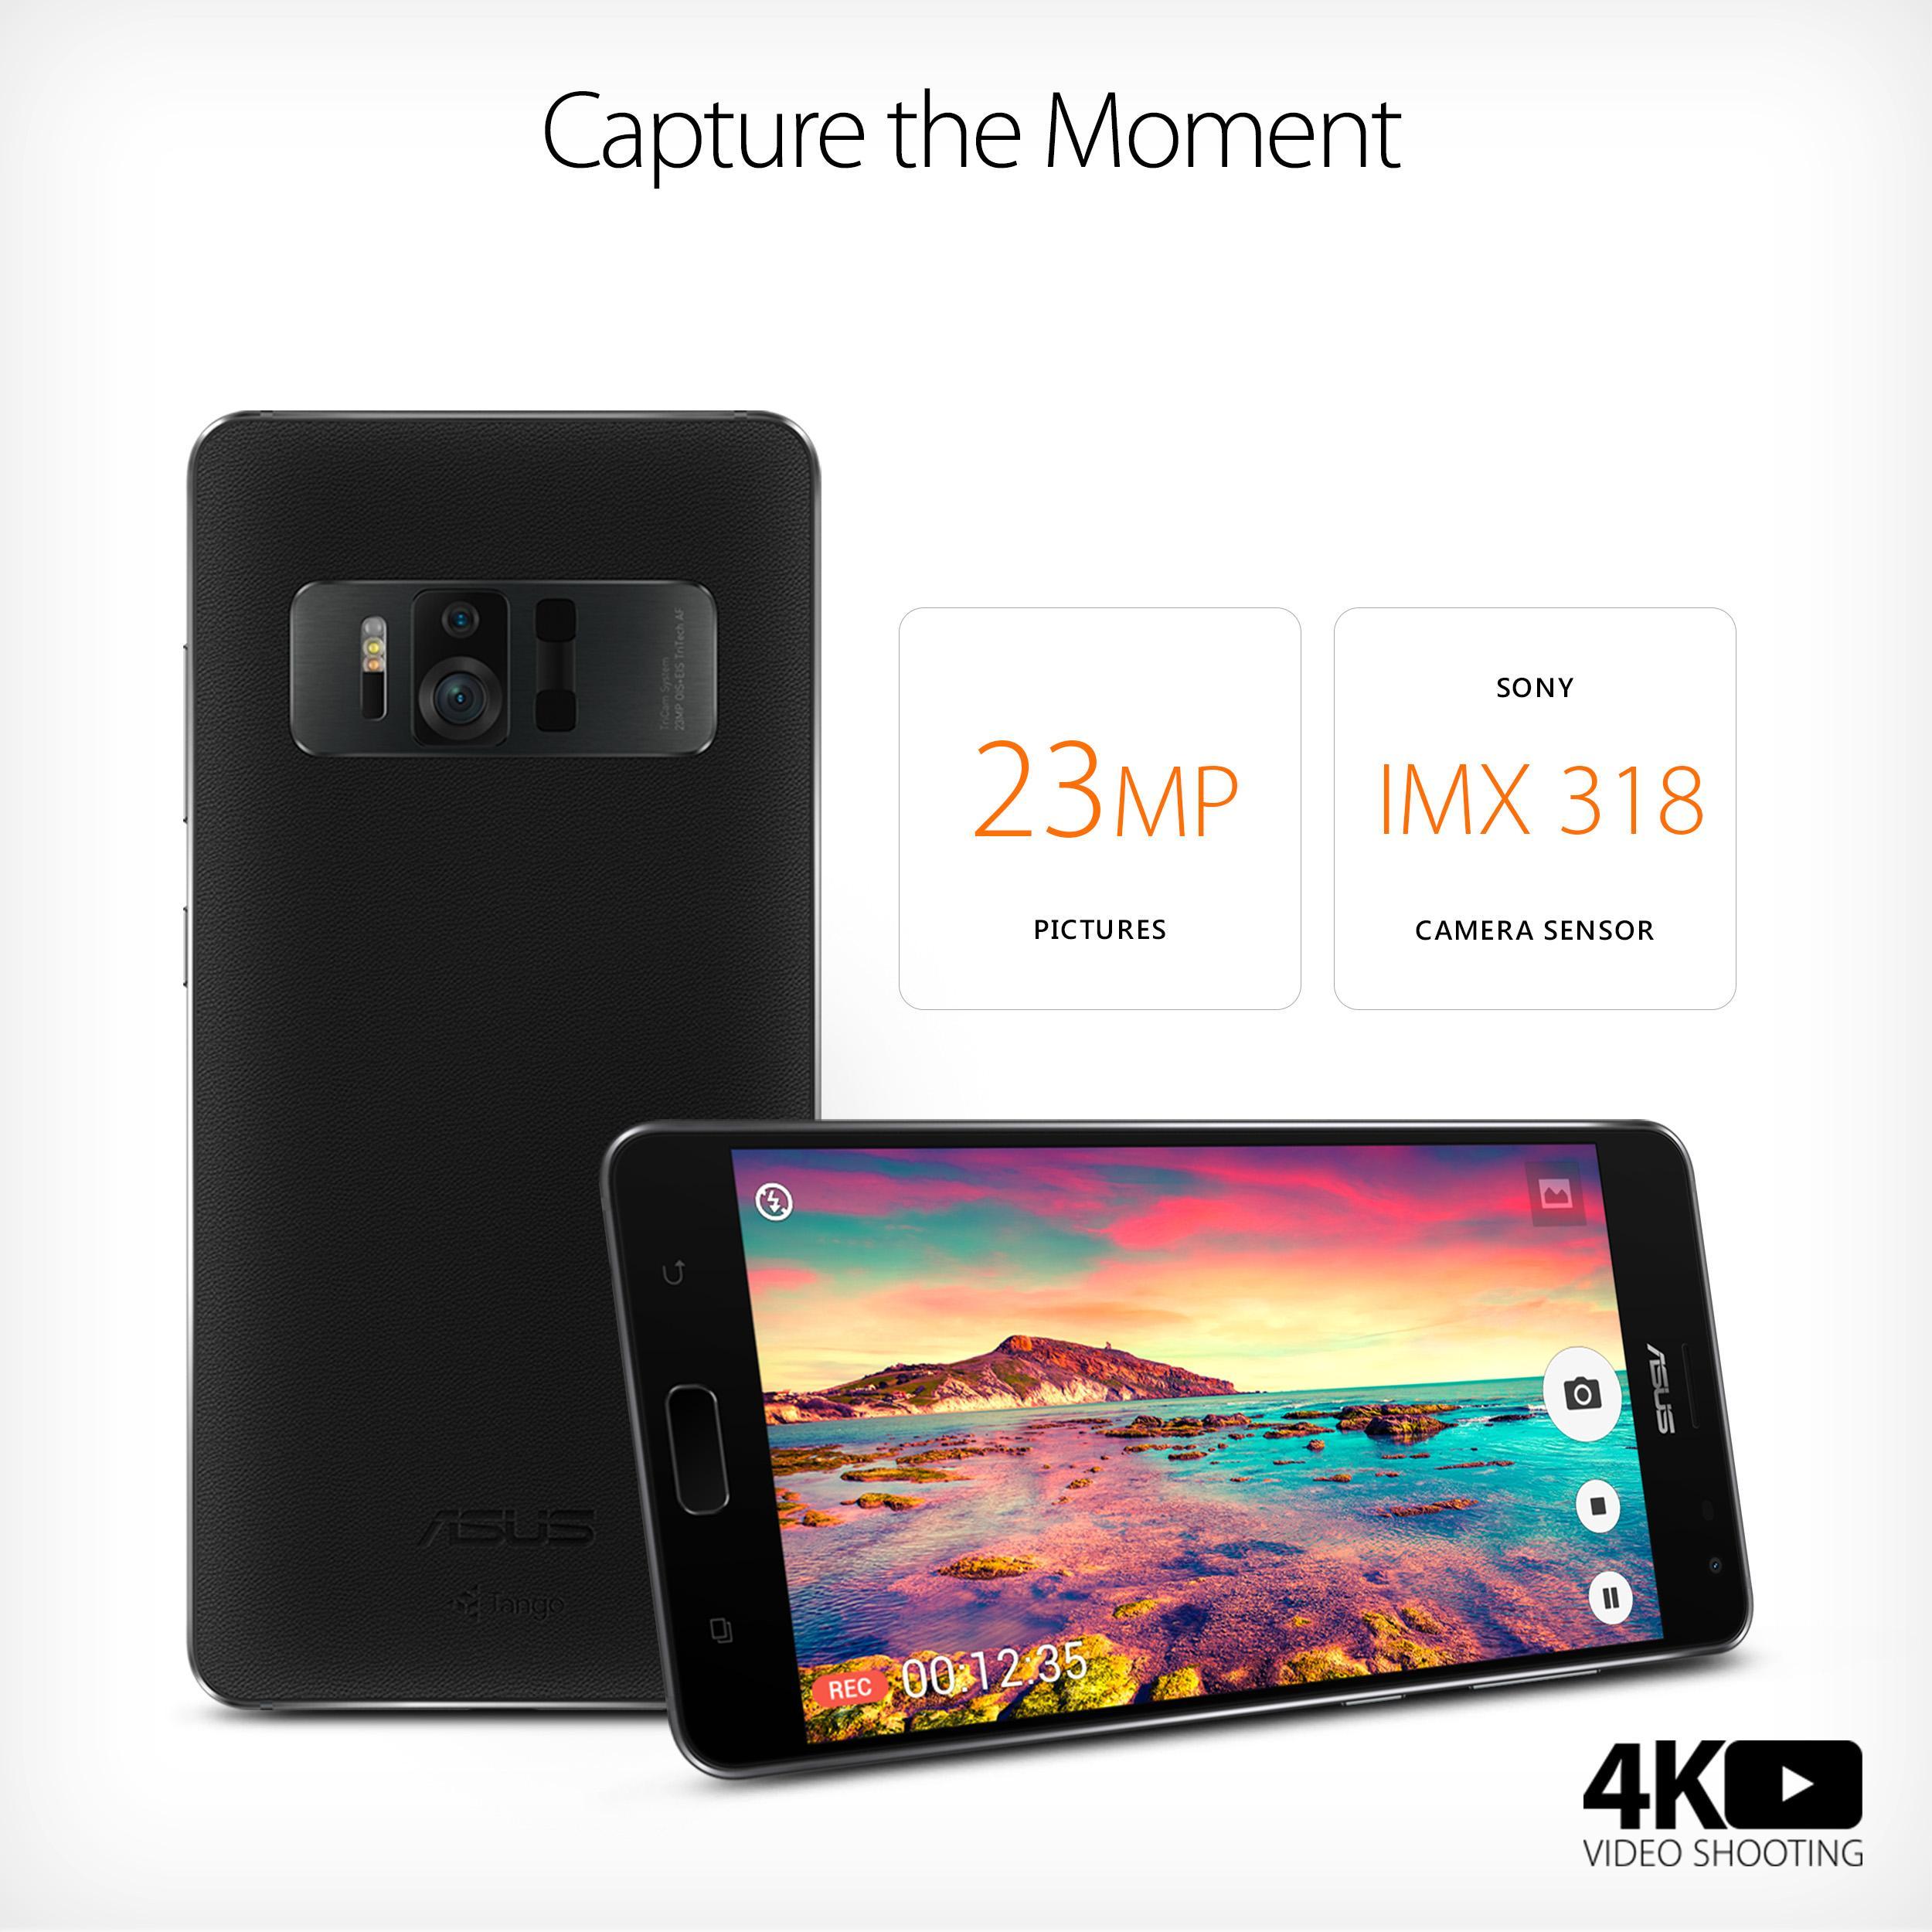 Amazon Contact Us: Amazon.com: ASUS ZenFone AR 5.7-inch WQHD AMOLED 6GB RAM